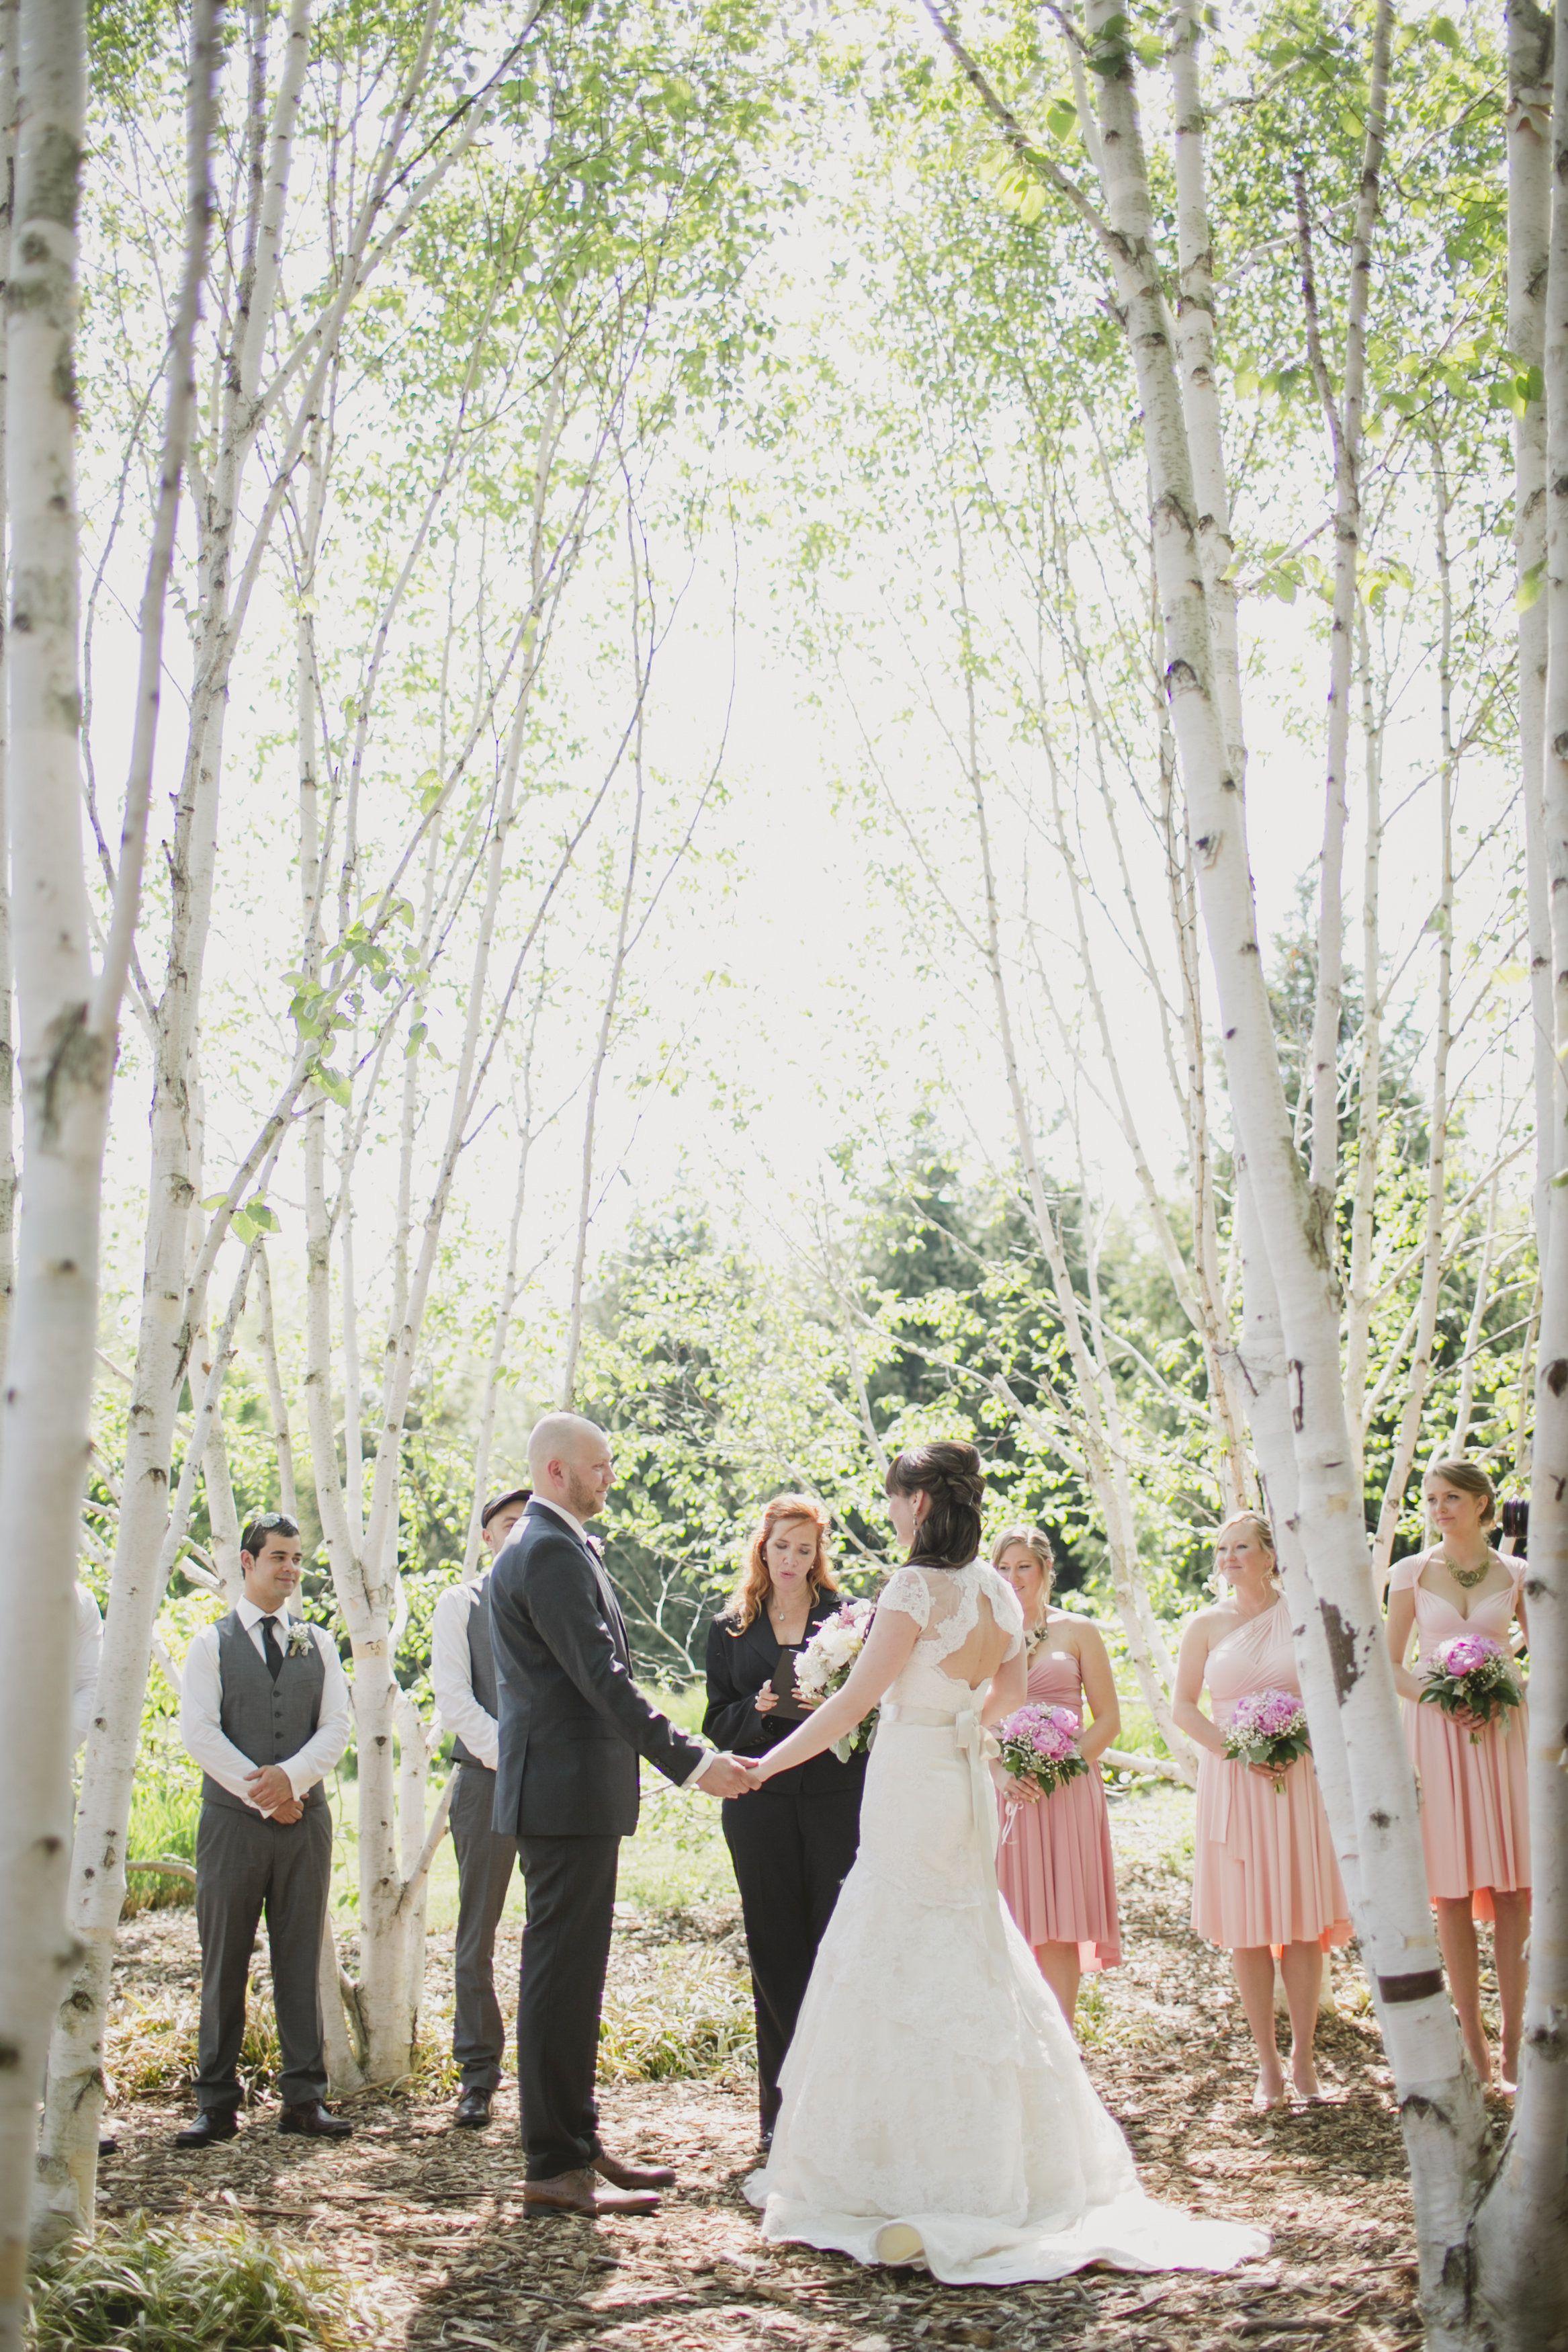 Niagara Parks Floral Showhouse Wedding